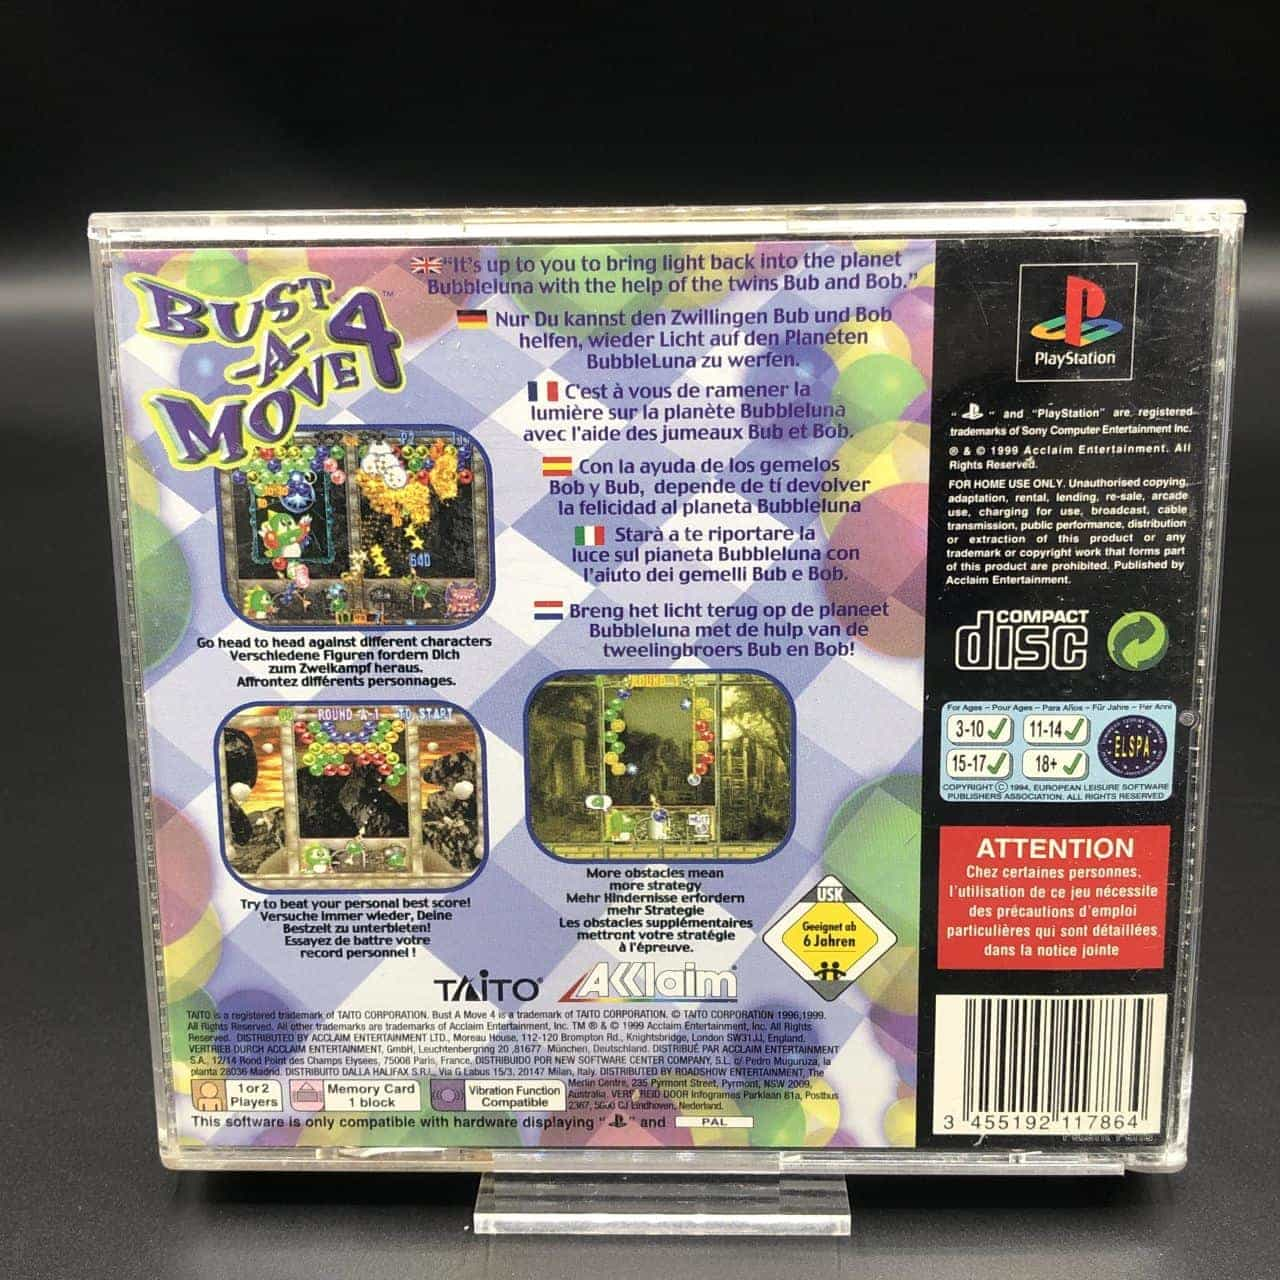 PS1 Bust-A-Move 4 (Komplett) (Gebrauchsspuren) Sony PlayStation 1